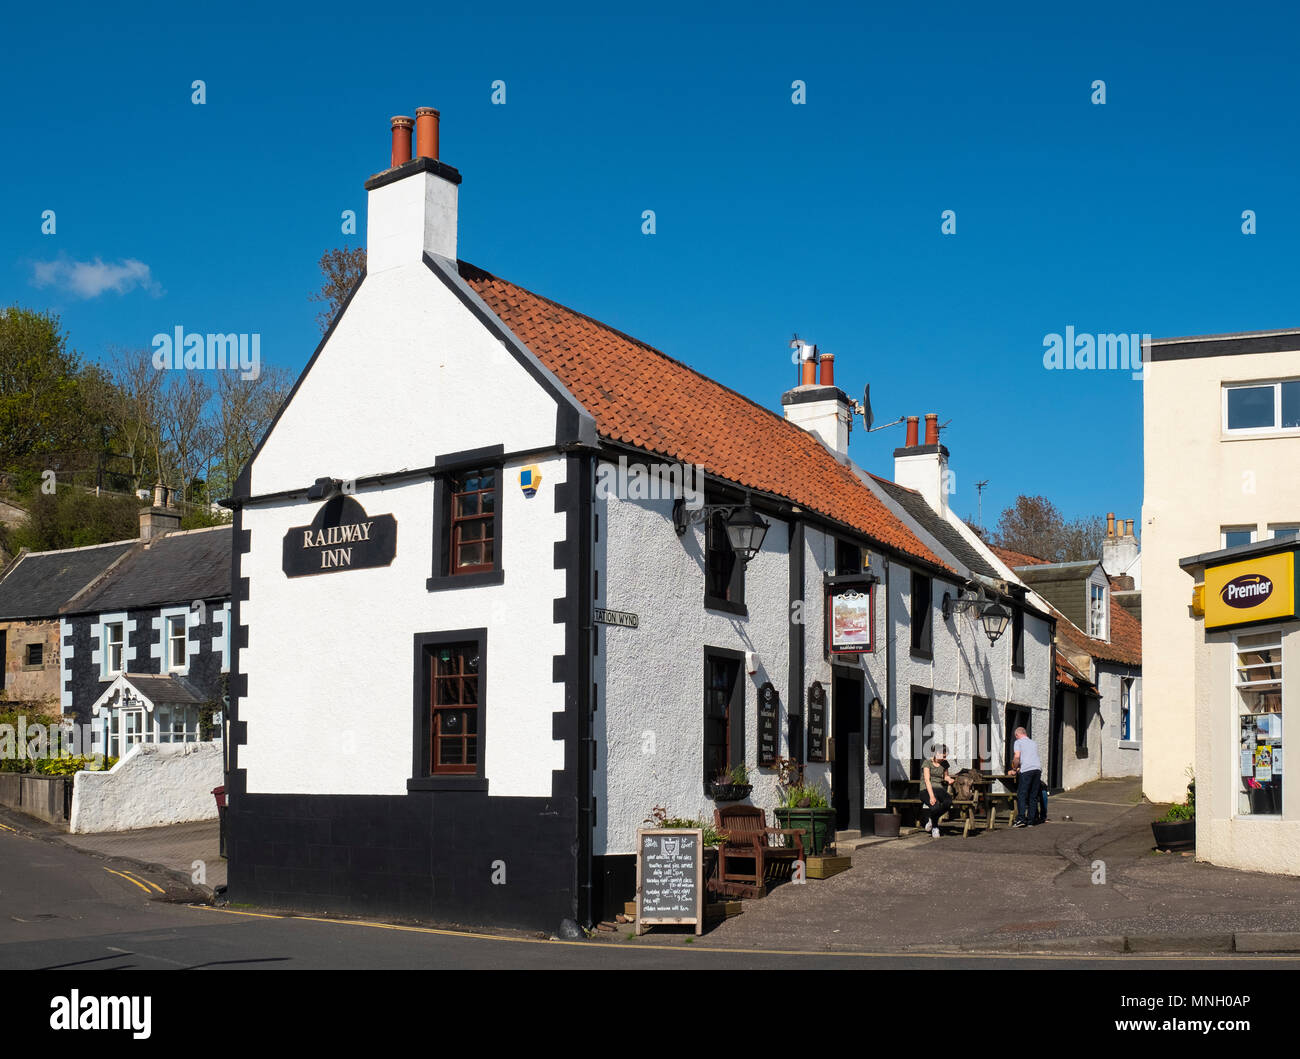 The Railway Inn pub in Lower Largo village in Fife, Scotland, UK - Stock Image